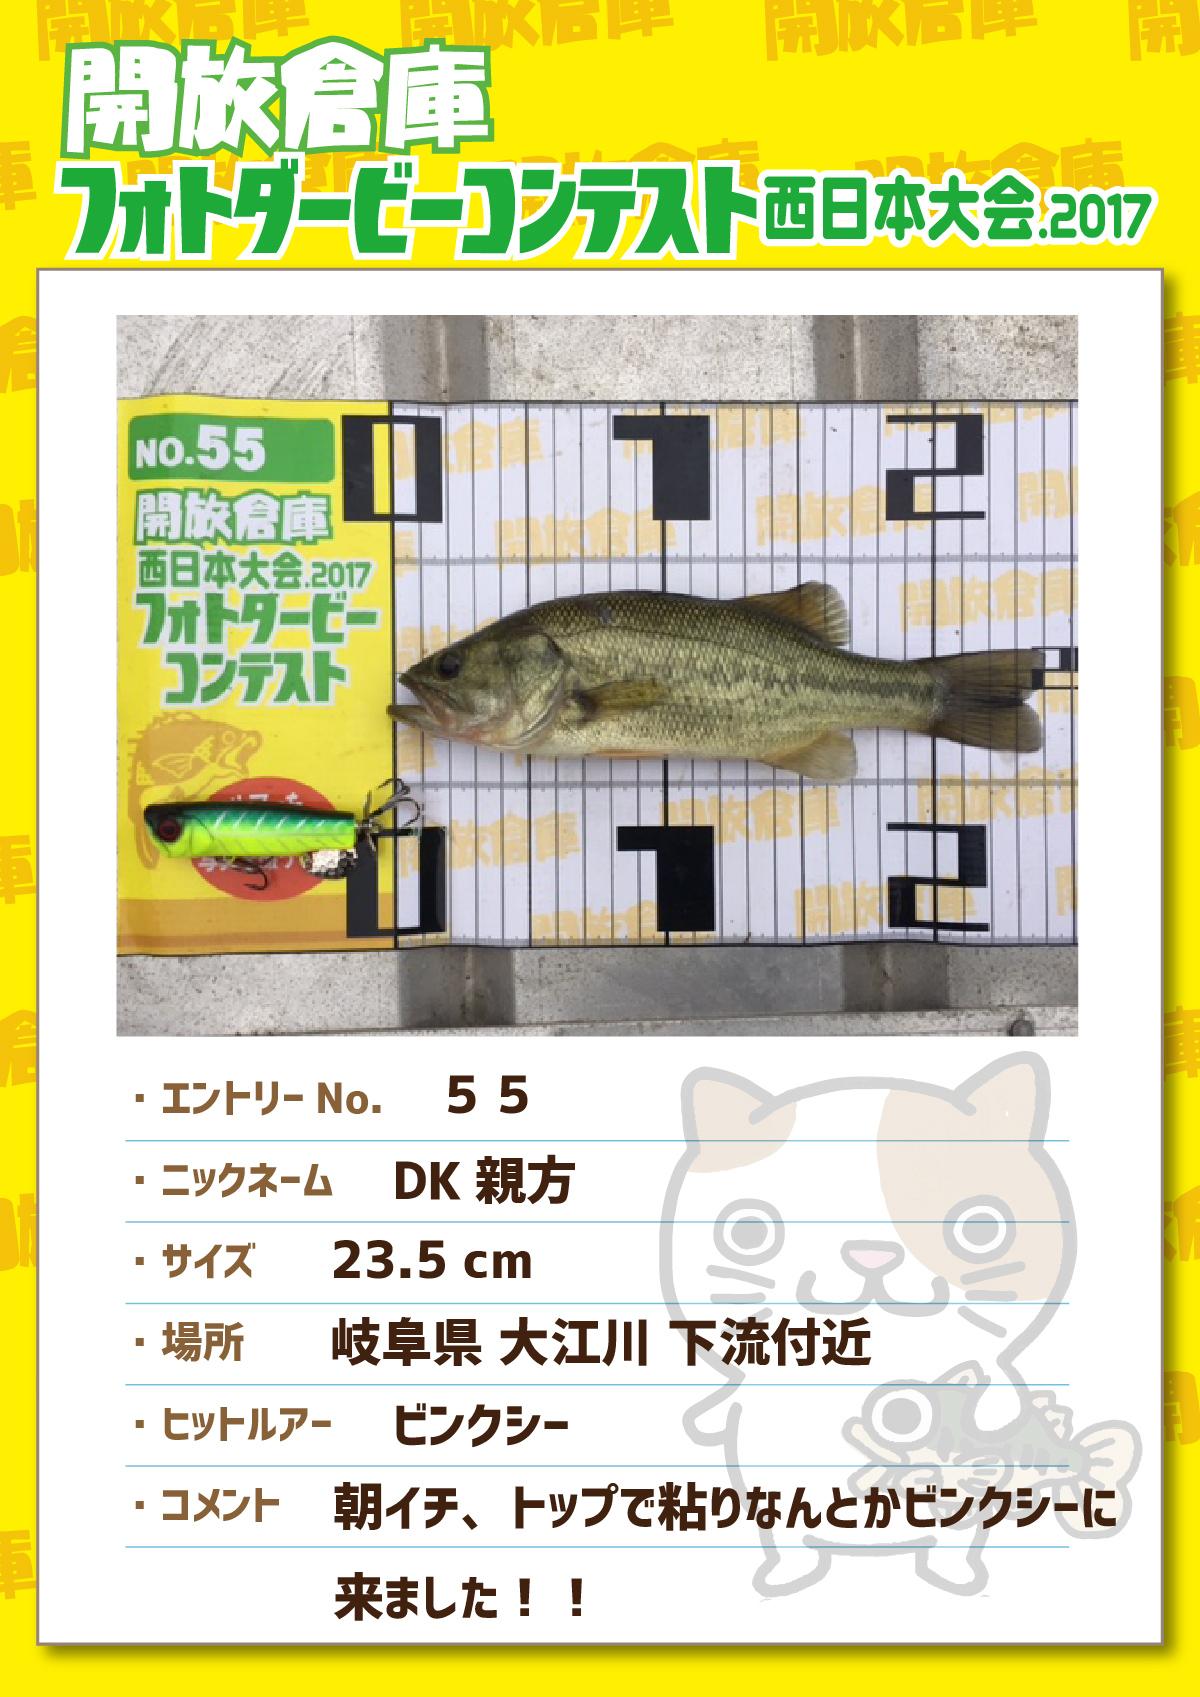 No.055 DK親方 23.5cm 岐阜県大江川下流付近 ビンクシー 朝イチ、トップで粘りなんとかビンクシーに来ました!!